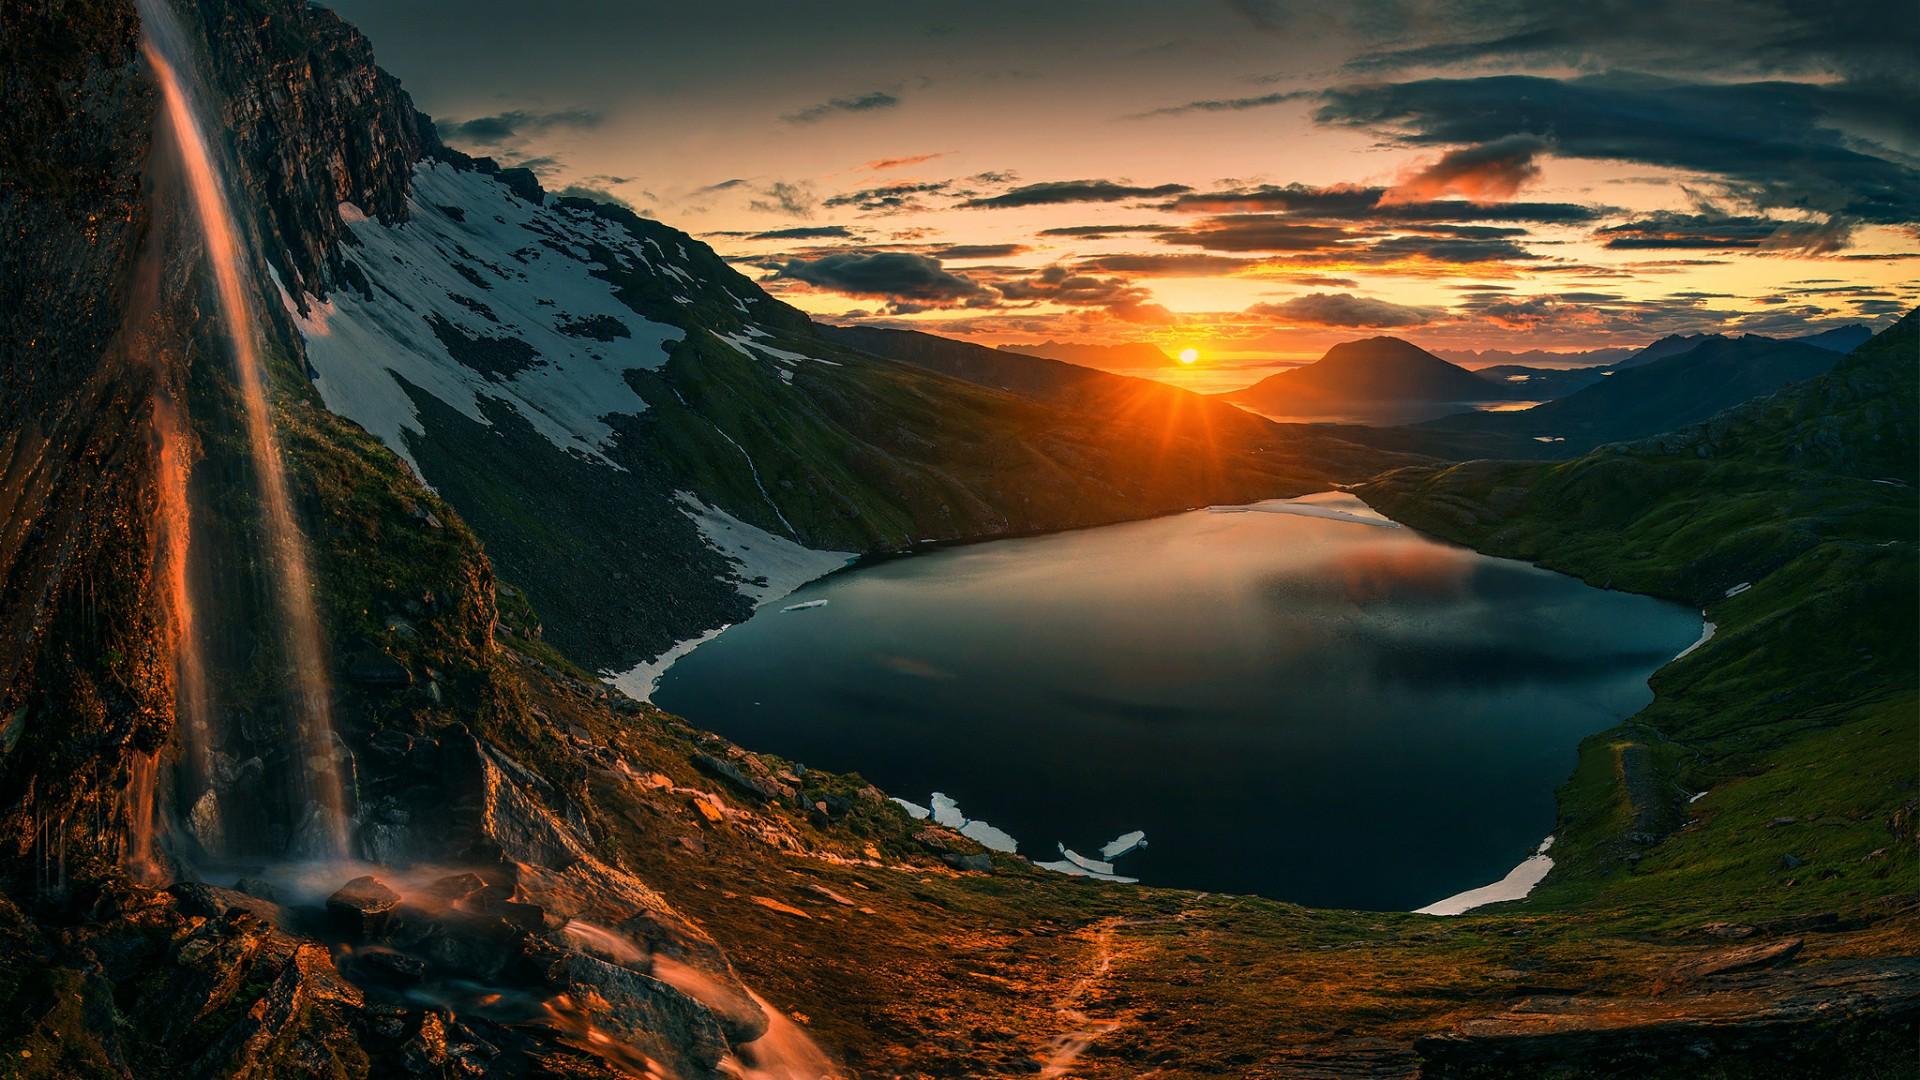 Sunset over Senja, Norway wallpaper - backiee